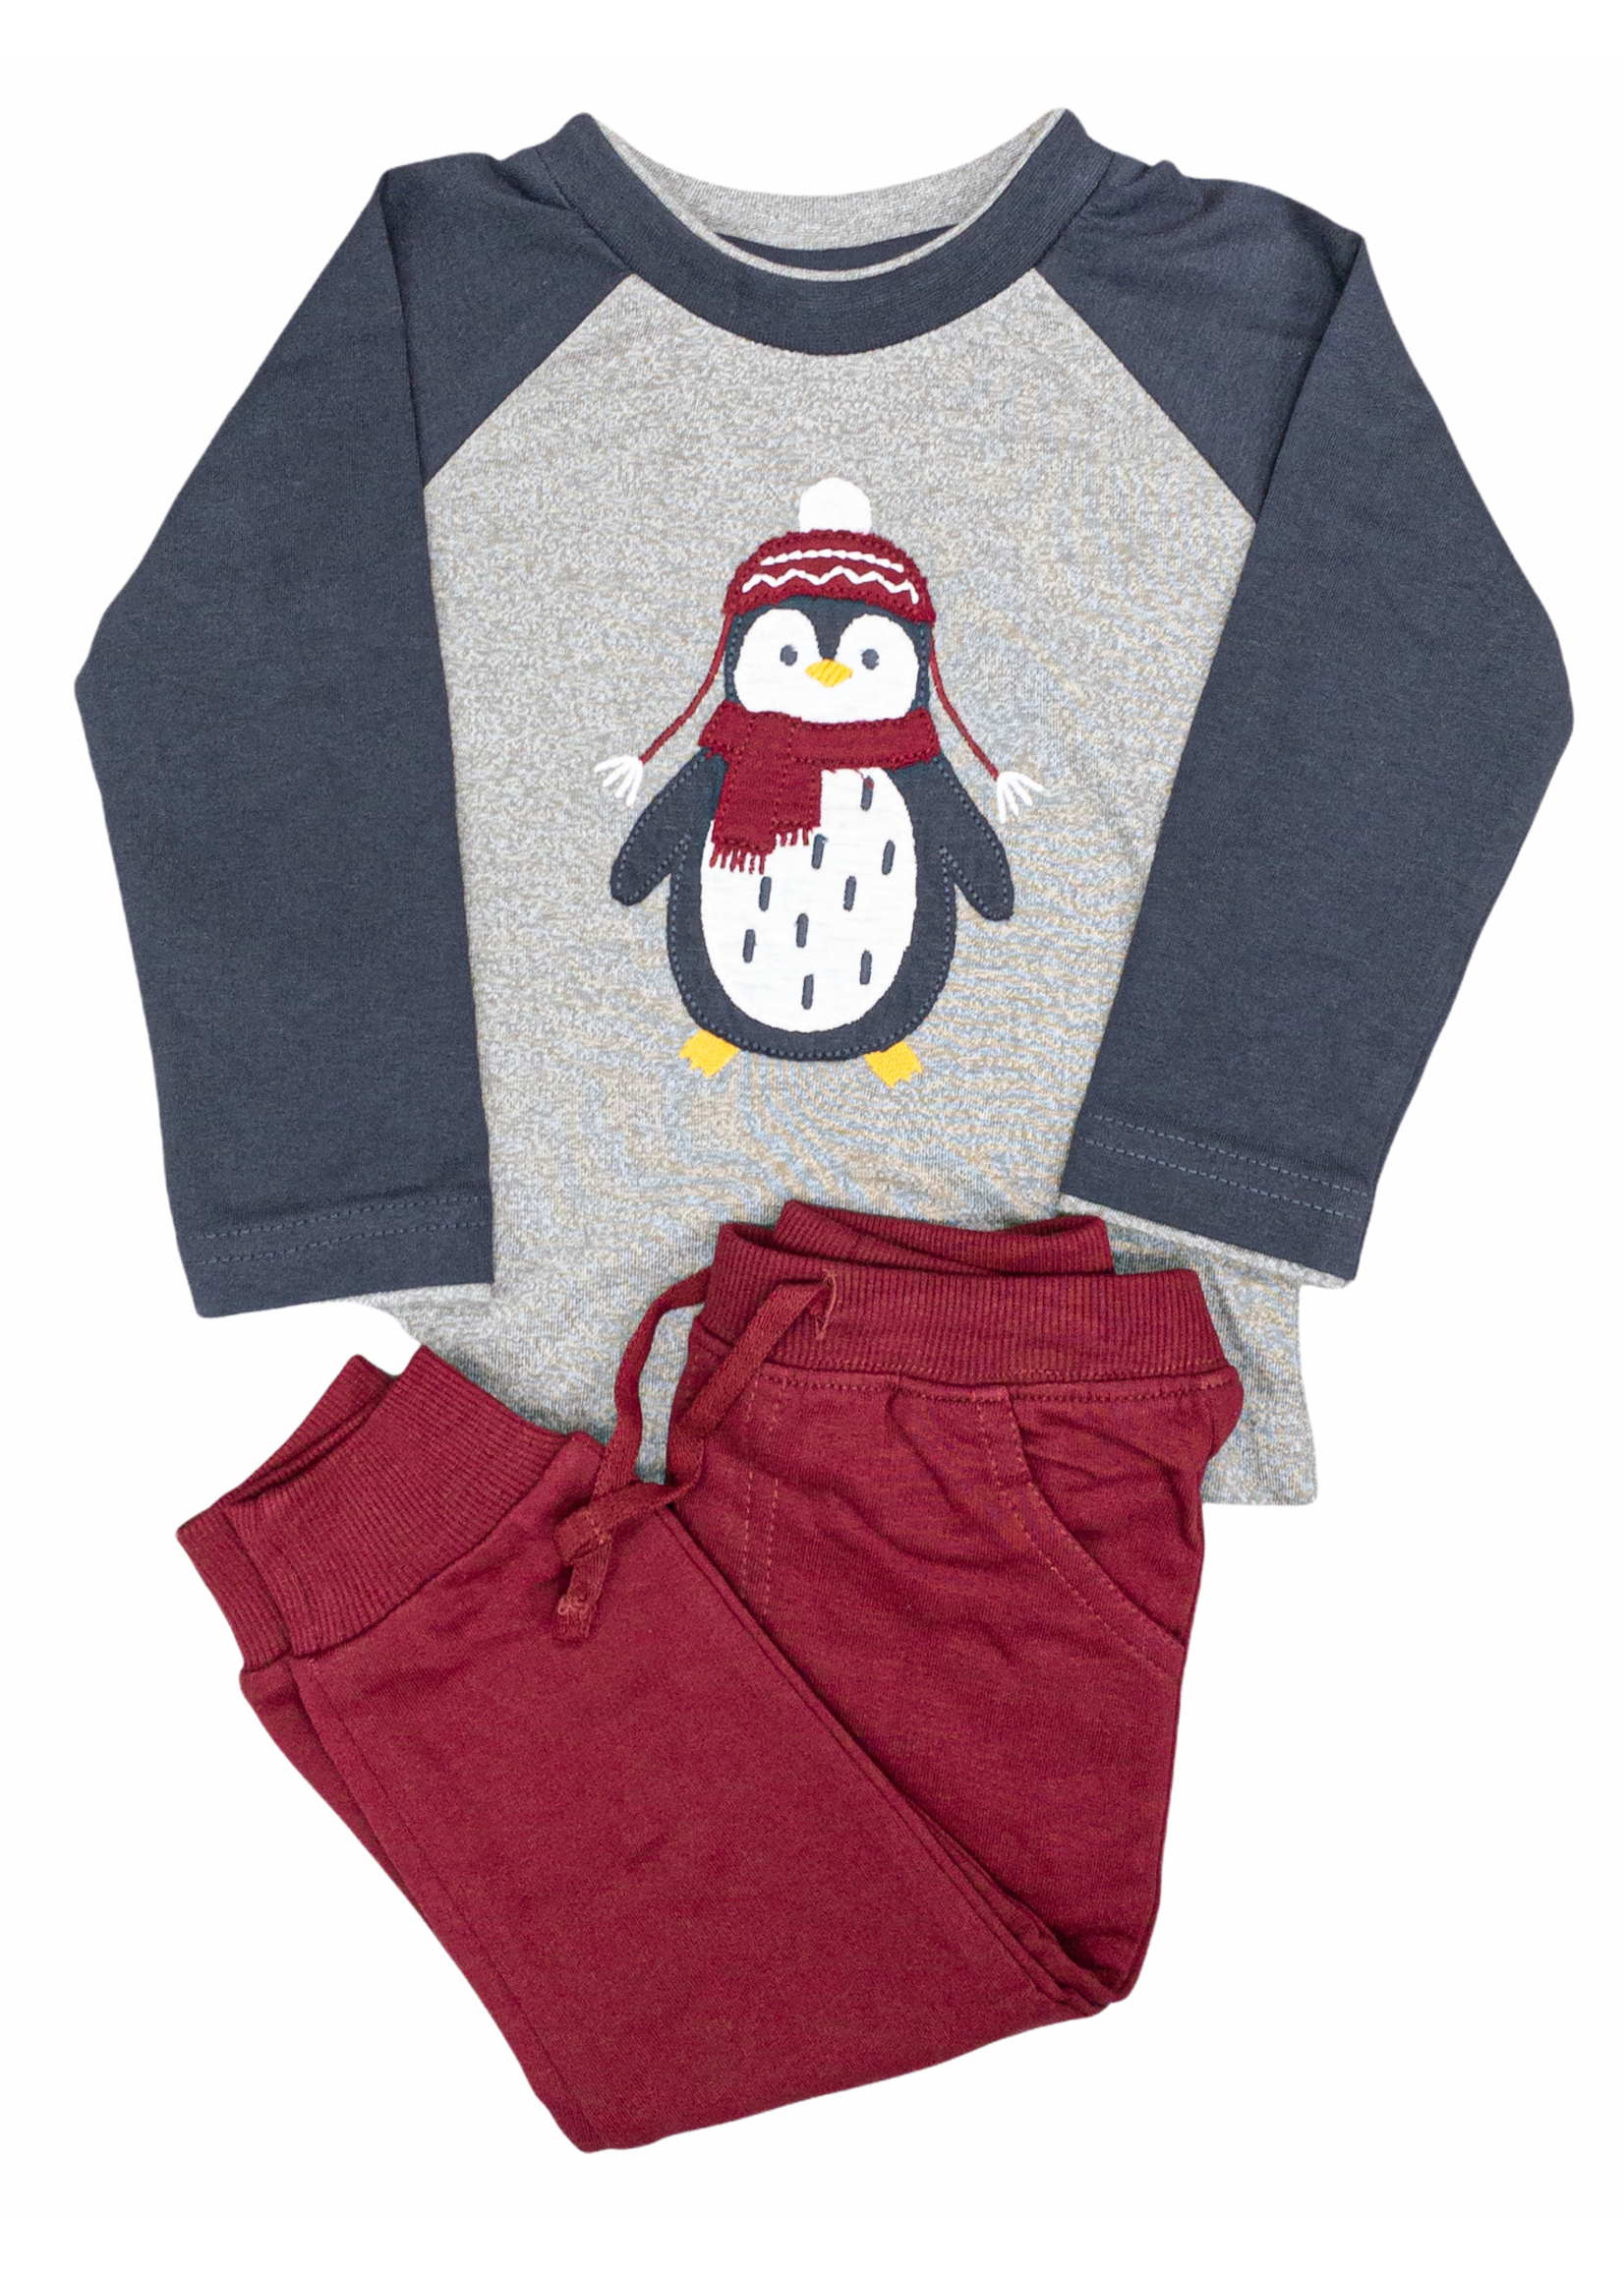 Minibama Applique Penguin Top Set